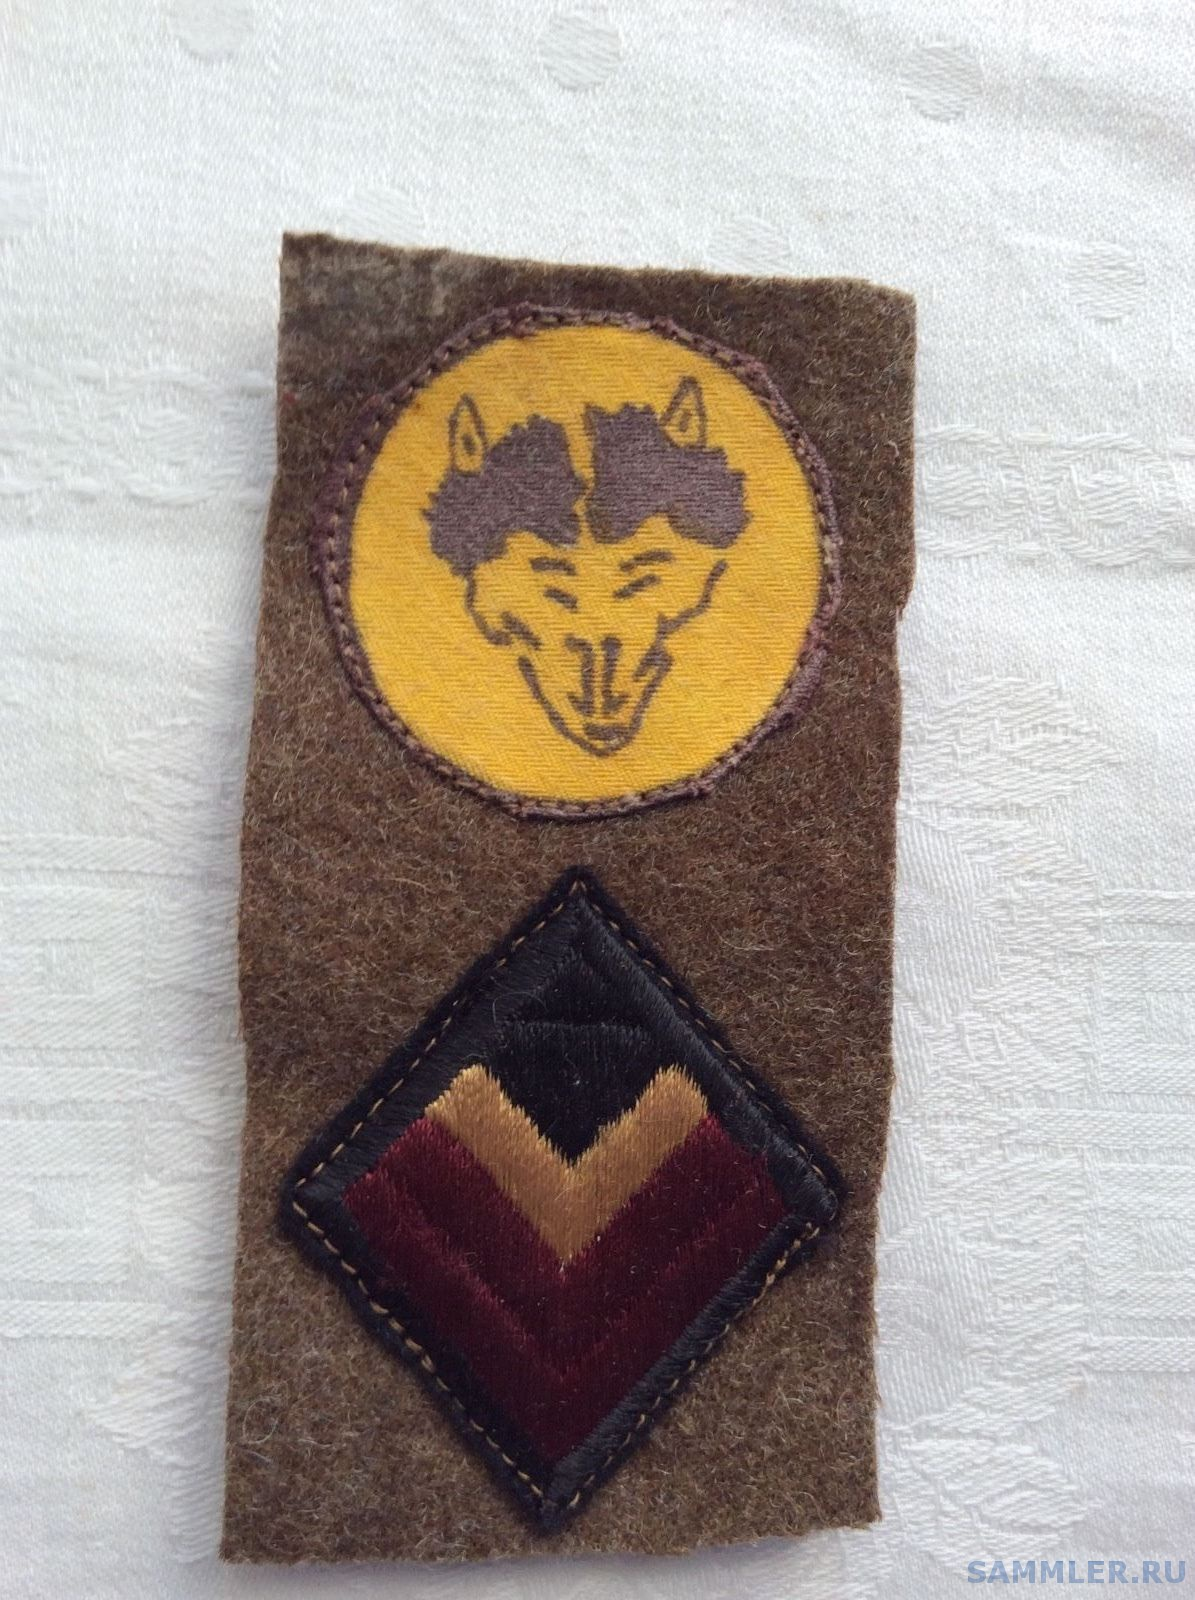 8th Armoured Brigade 4-7th R. Dragoon Guards.JPG